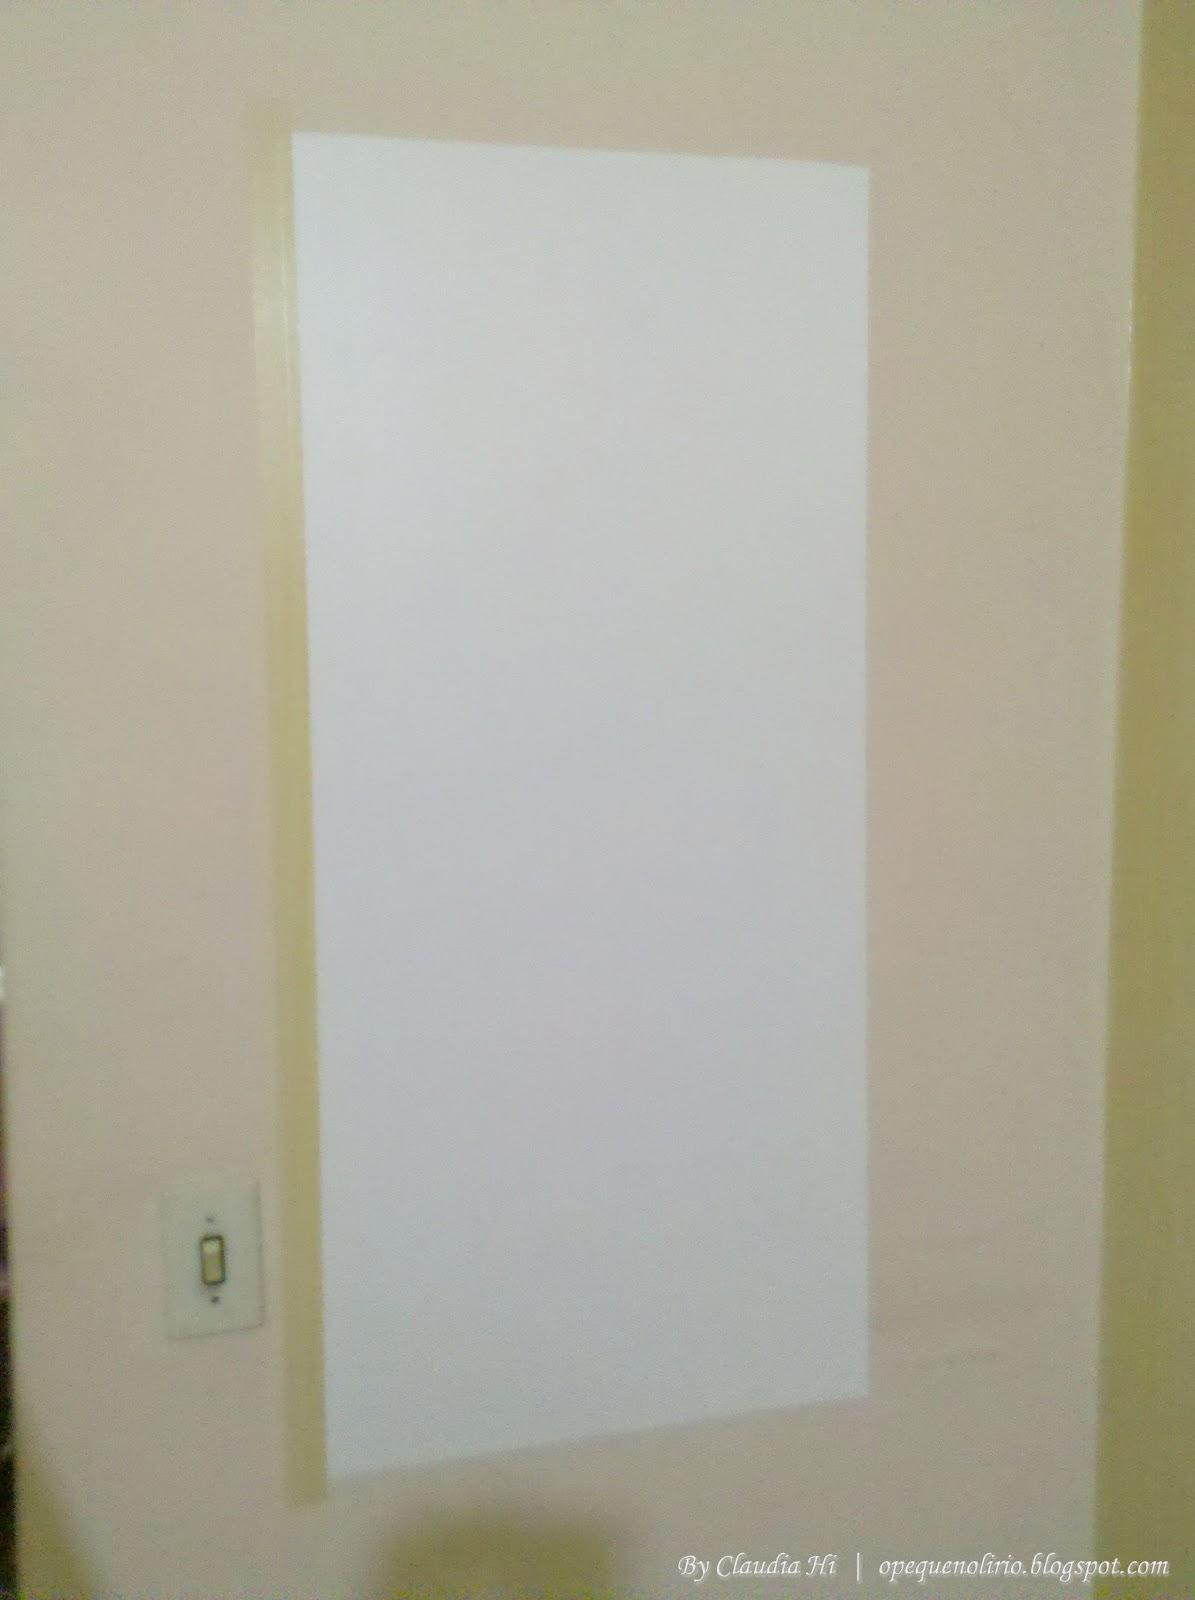 parede, lousinha, mural, bordas de contact, desenhar, quadro branco, slate, whiteboard, frame